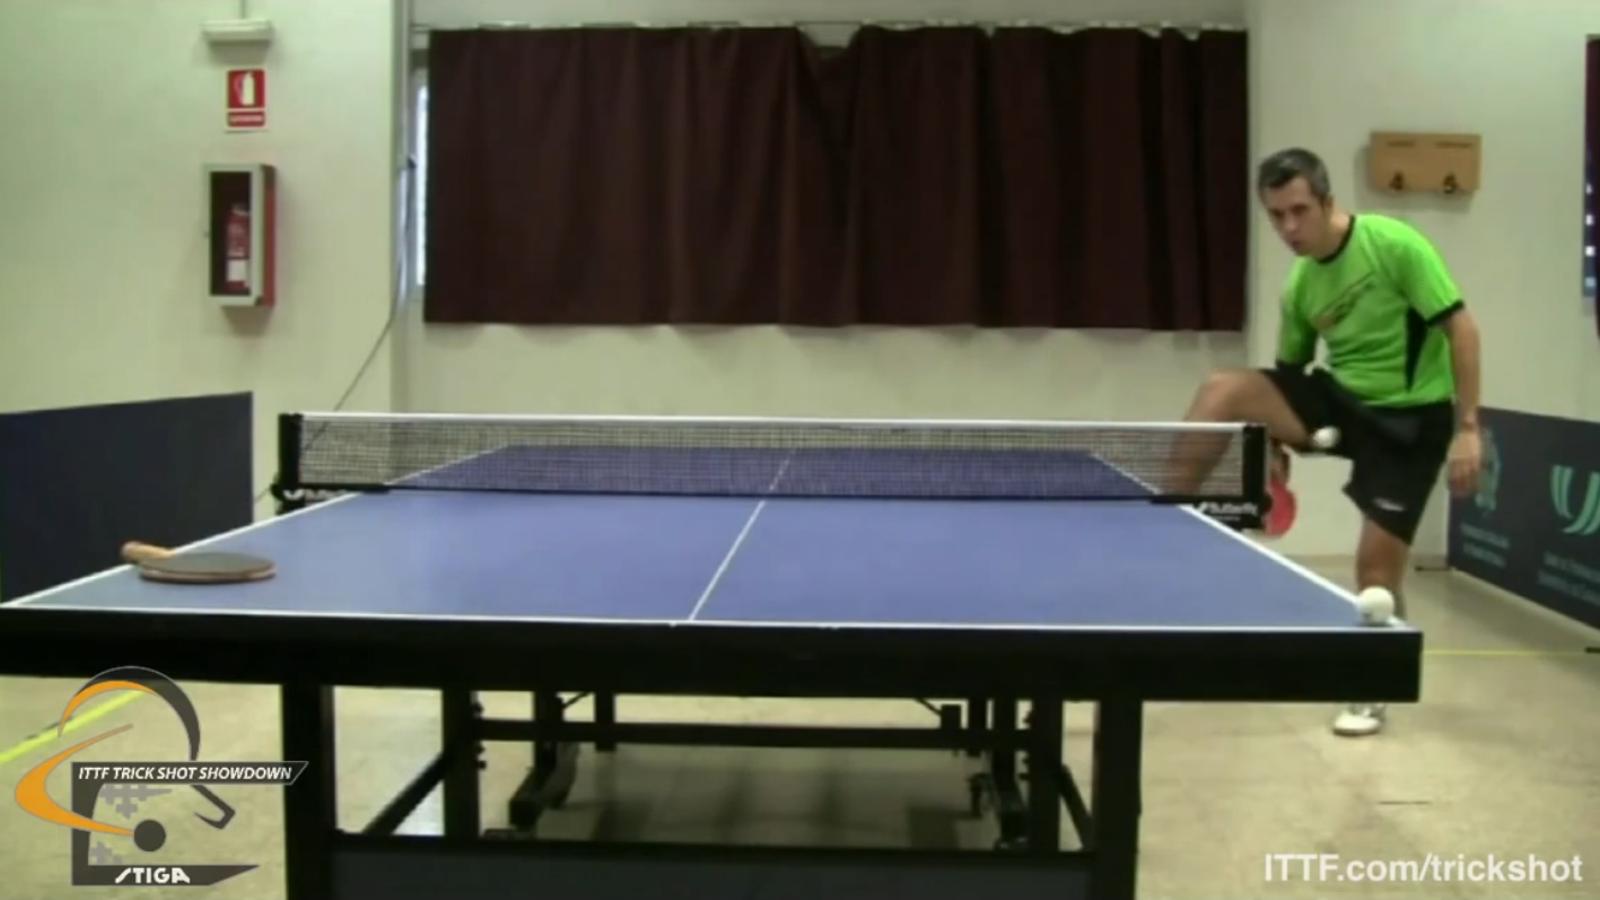 El palista català Josep Anton participa en un concurs internacional de trucs de tenis taula